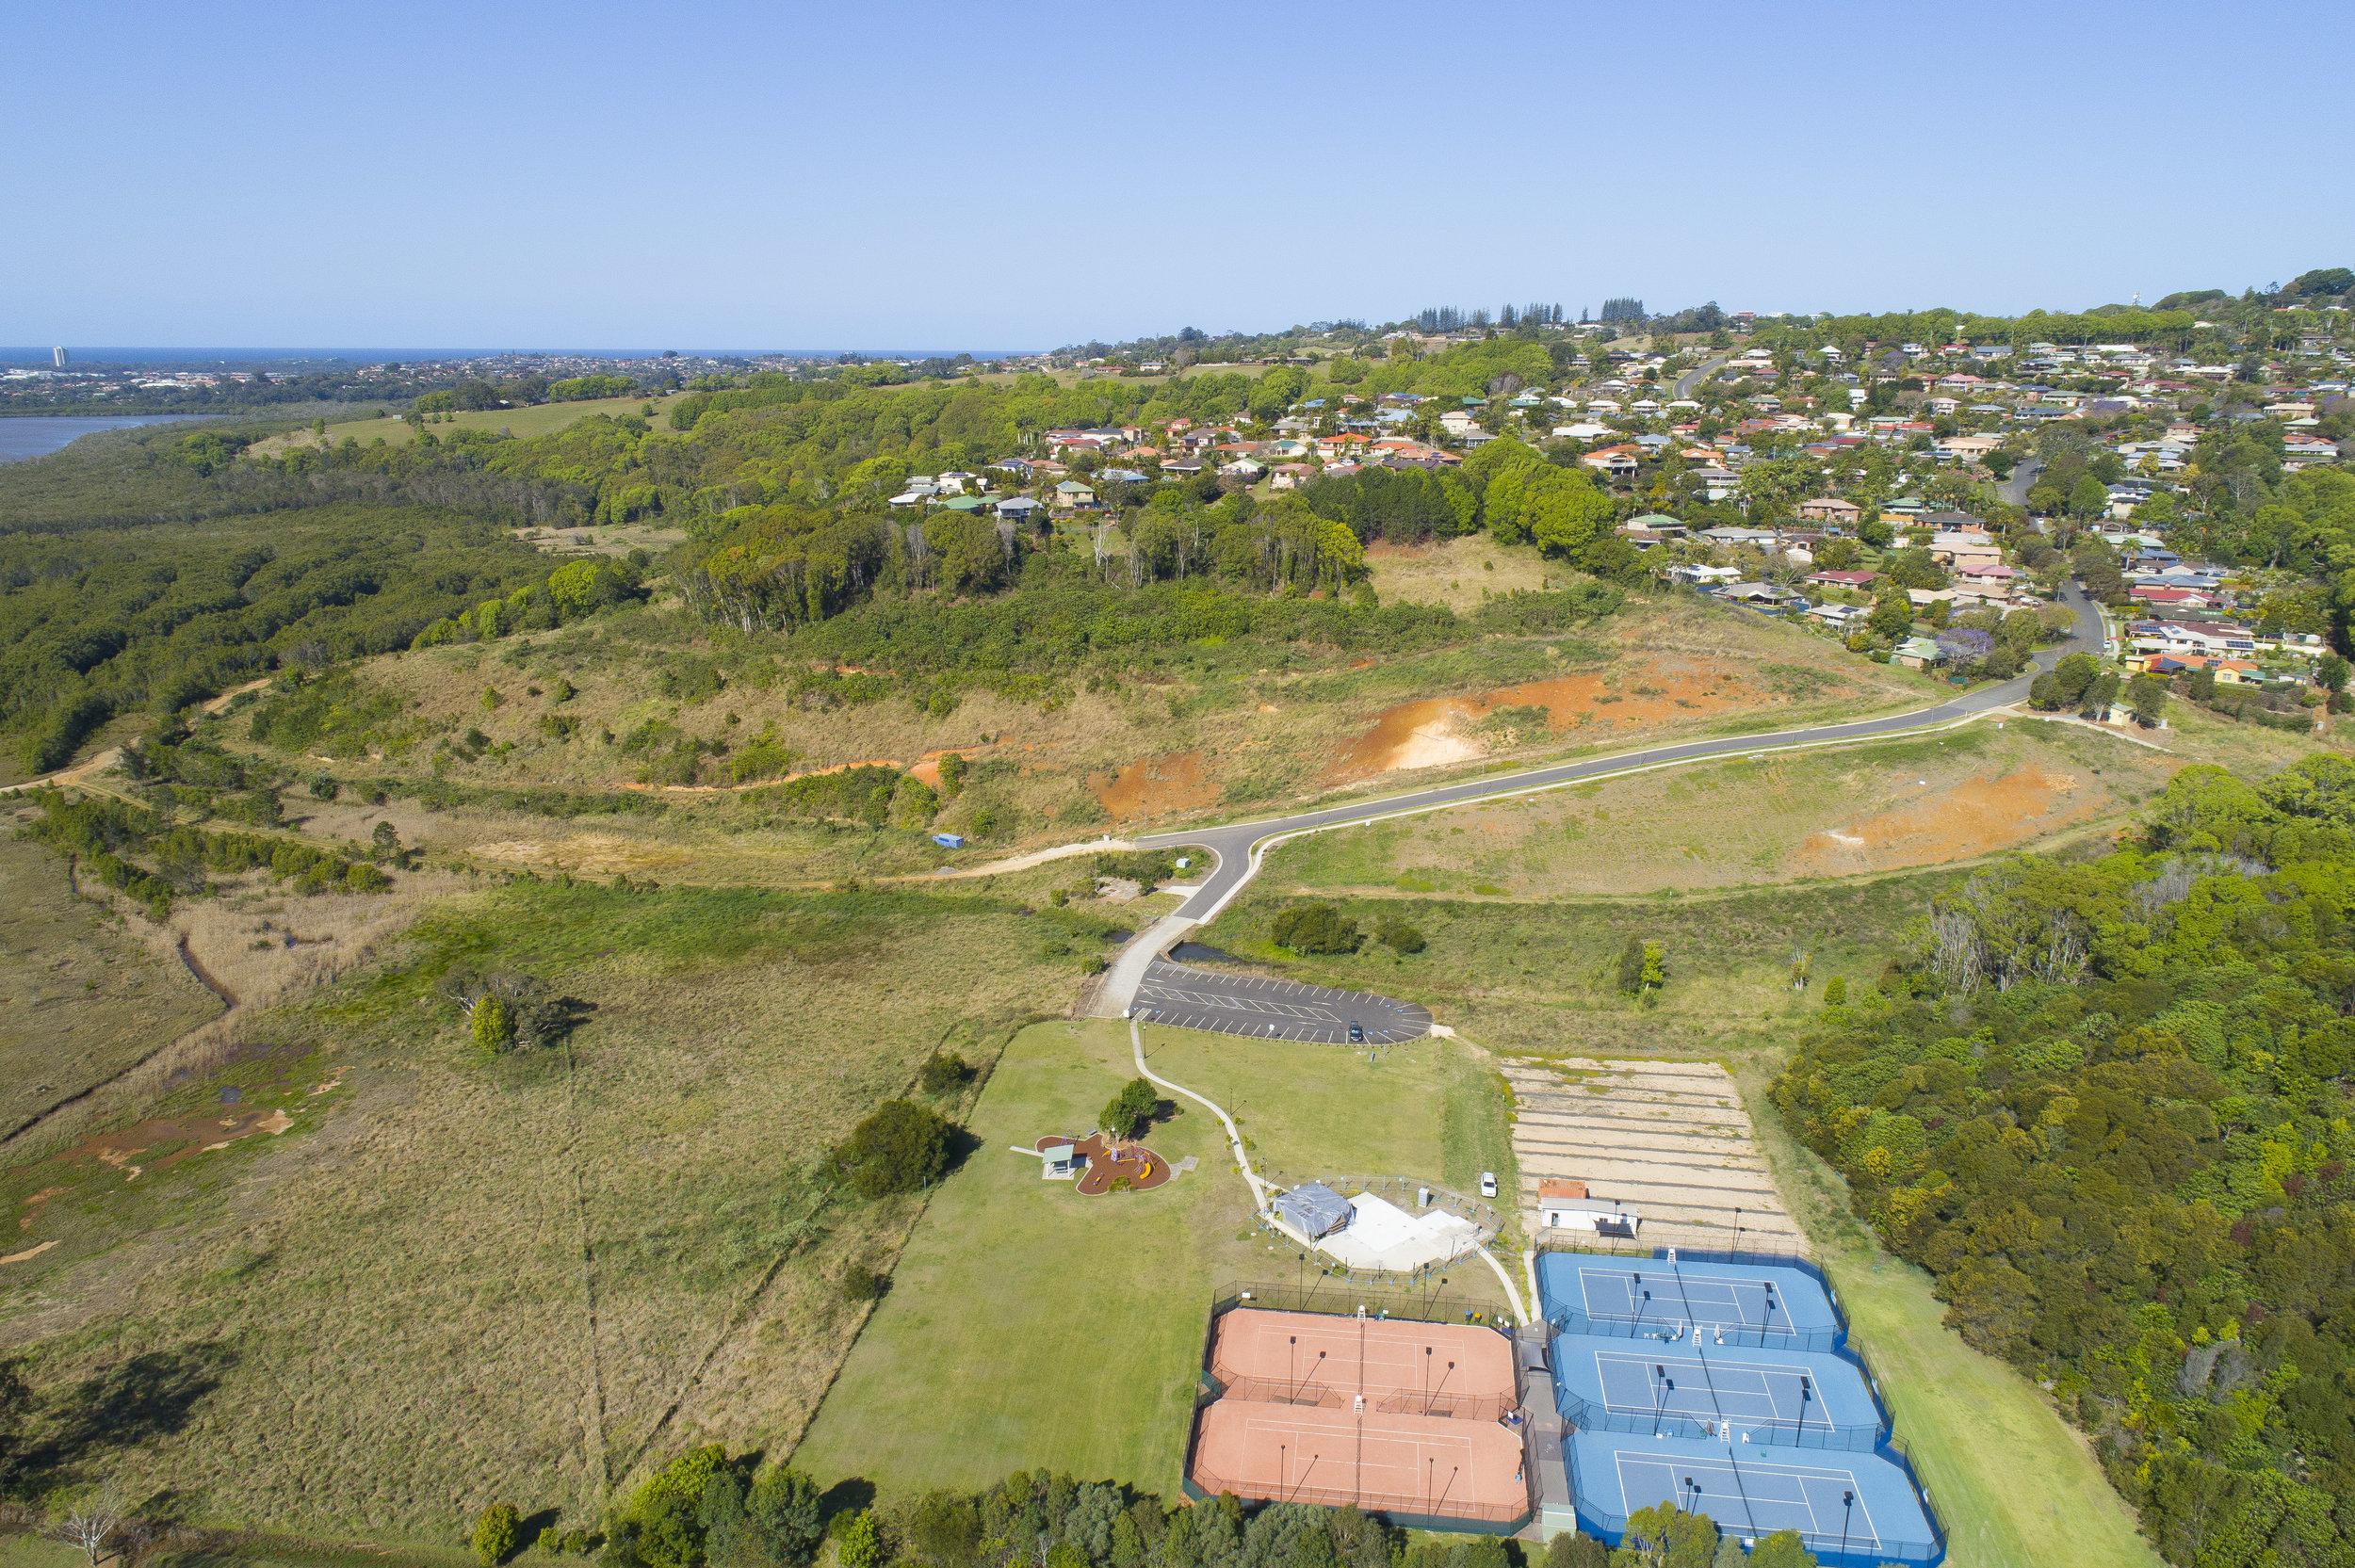 Aerial Hotshots_Henry lawson Drive Terranora_09192018009.jpg